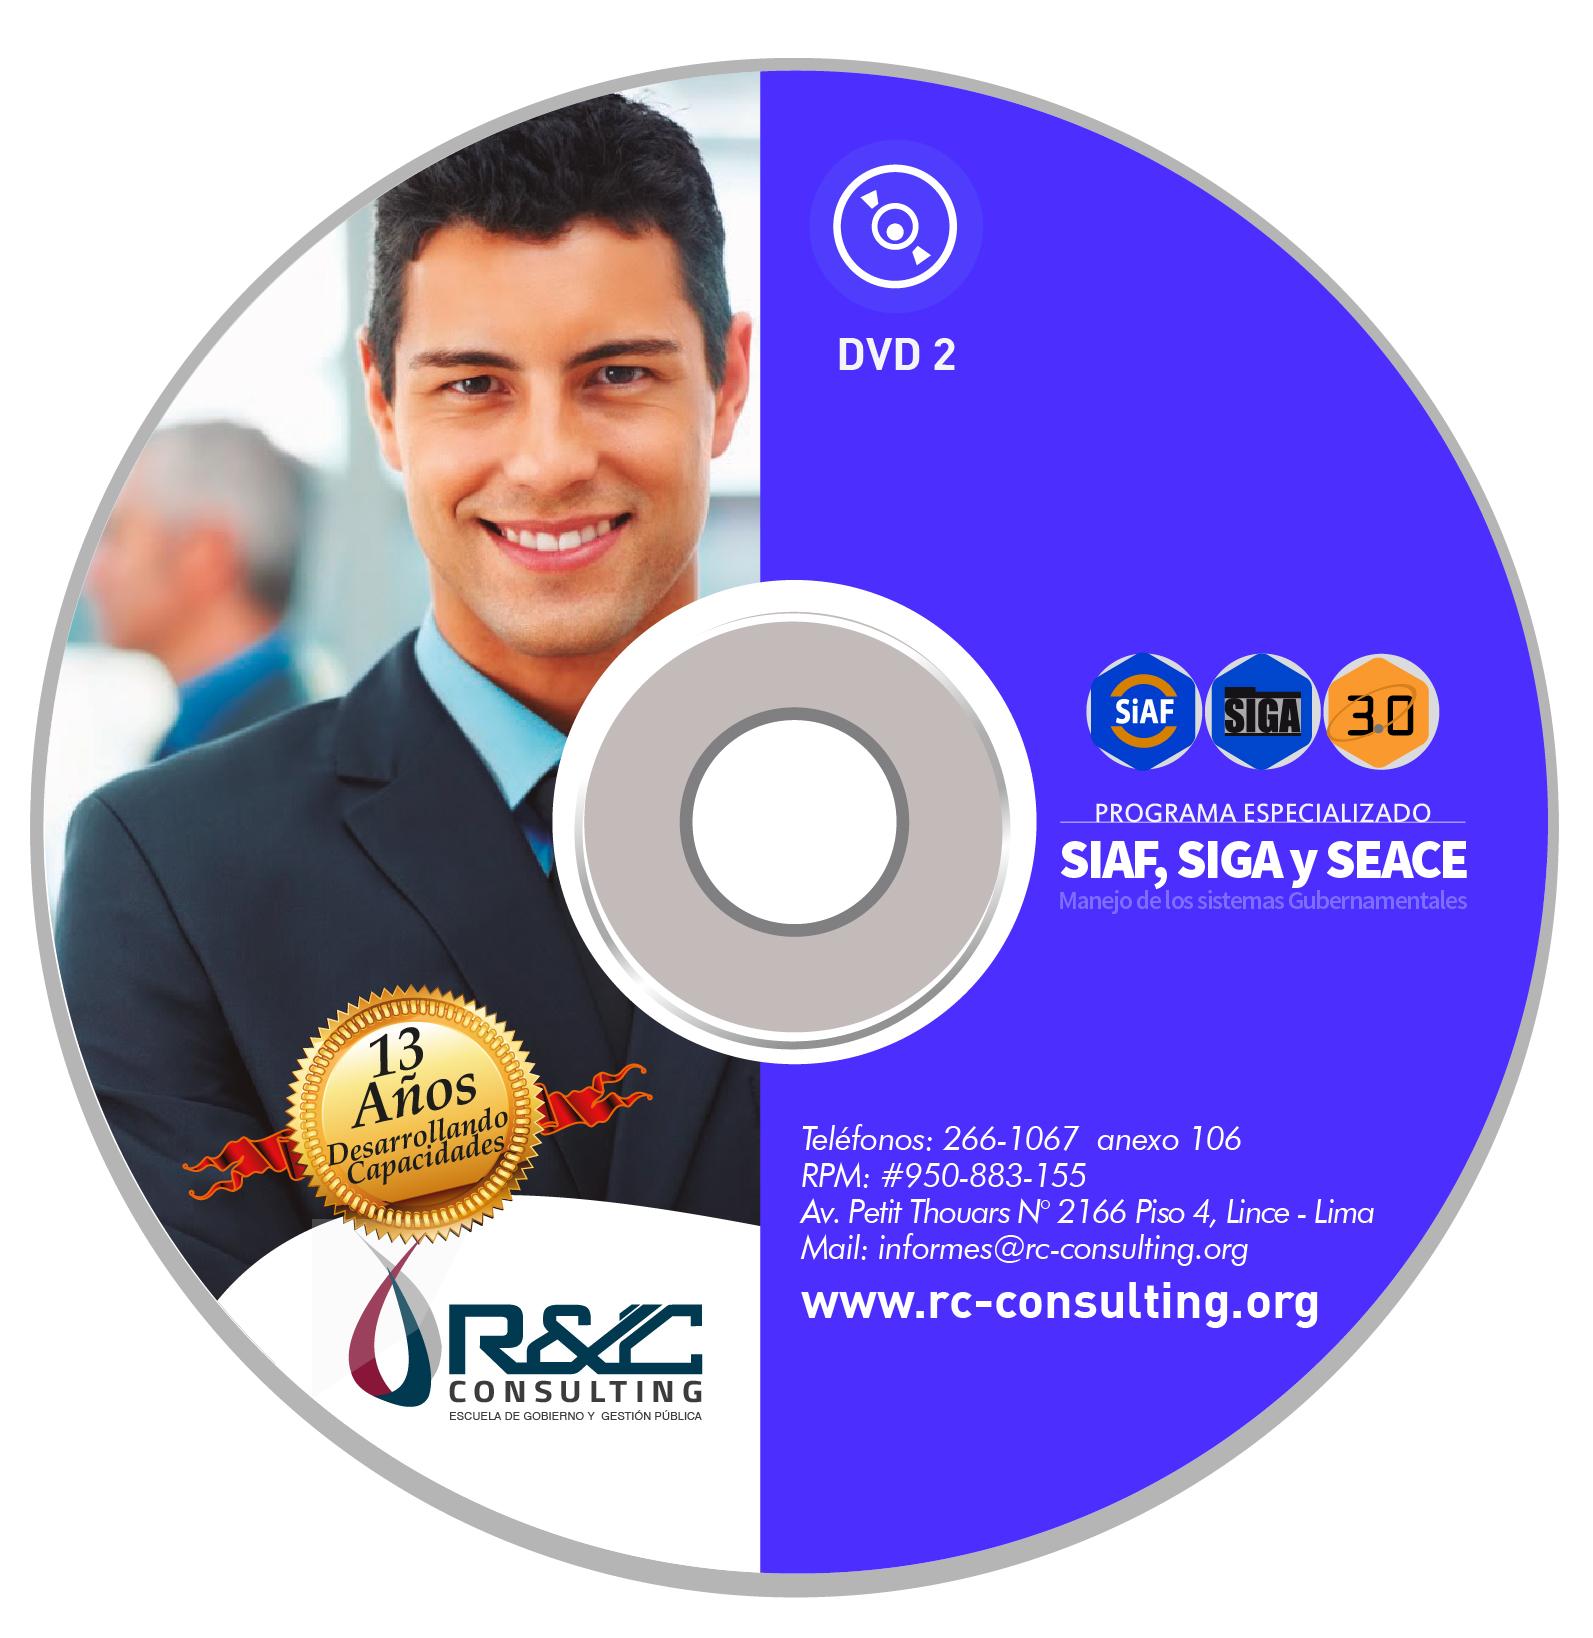 DIPLOMADO SSS2 Capacitacion de Gestion Publica en DVD